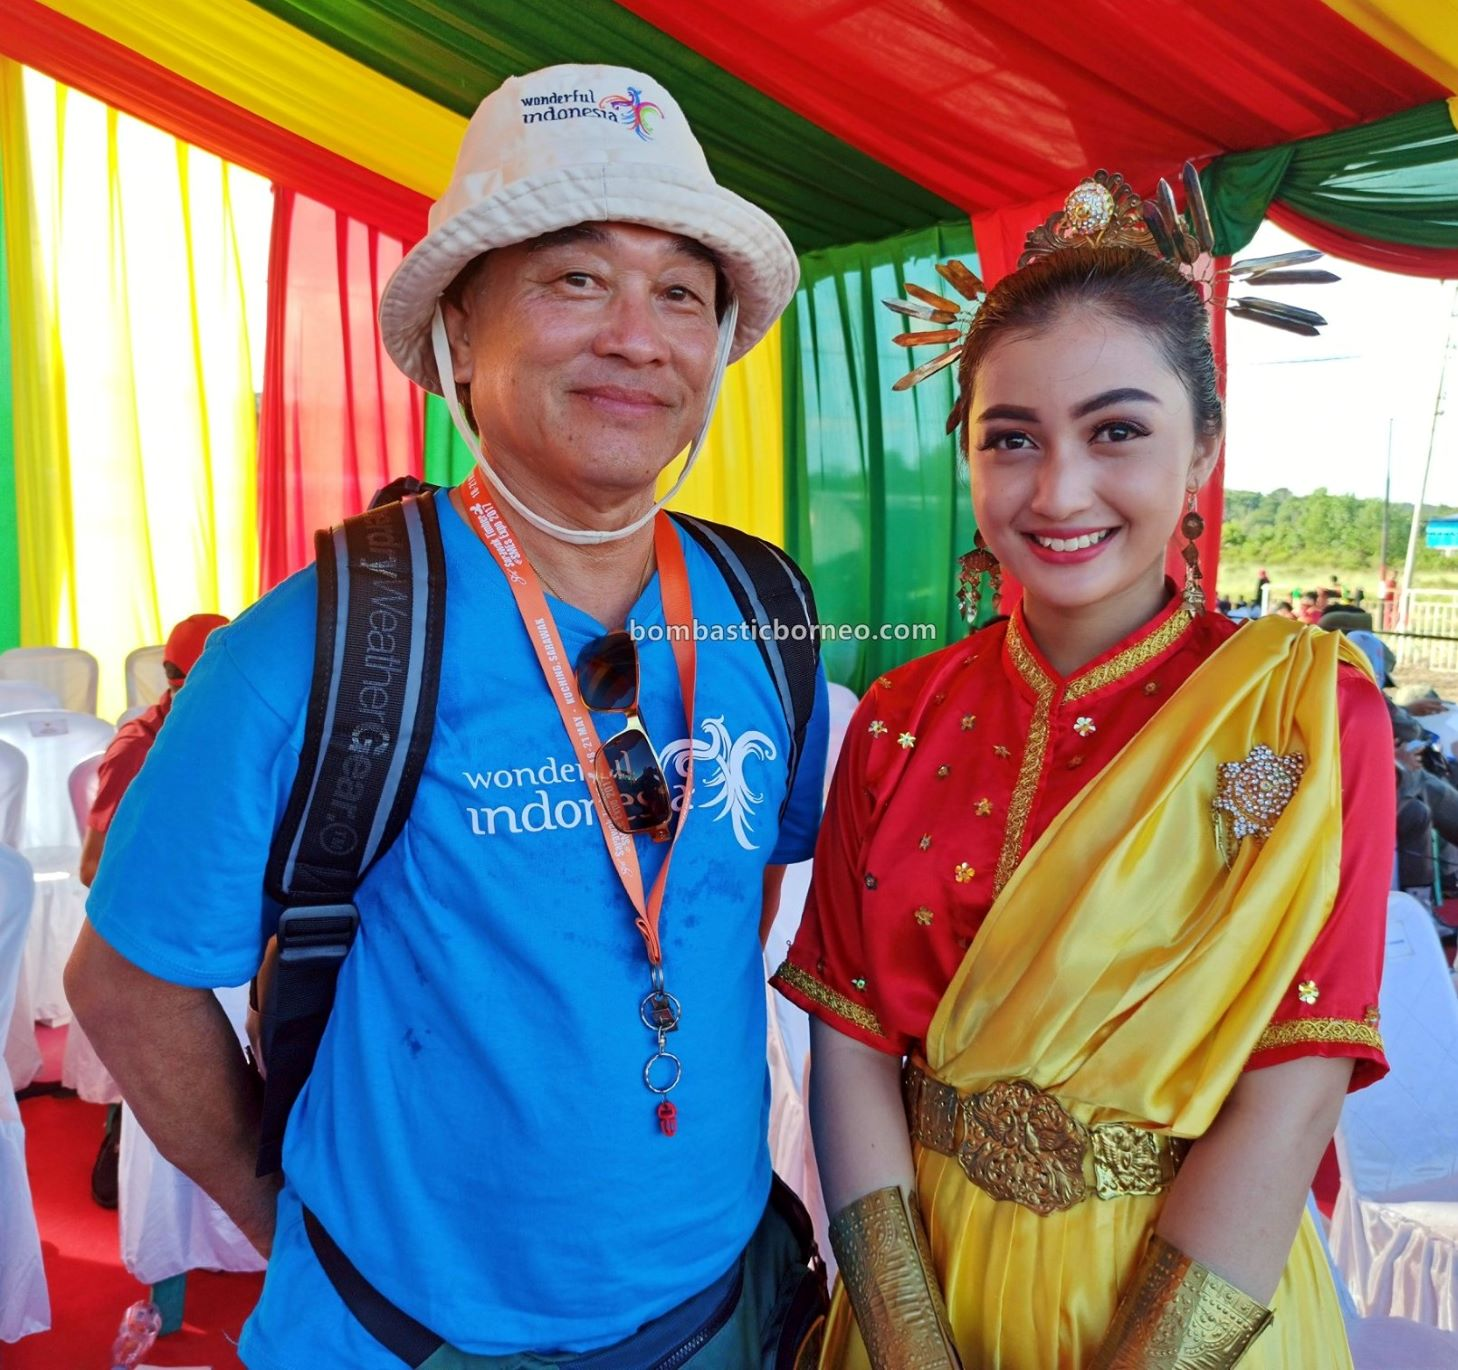 Festival Iraw Tengkayu, culture, traditional, destination, event, Ethnic, native, tribal, Kalimantan Utara, Pariwisata, Tourism, trans borneo, 探索婆罗洲印尼游踪, 北加里曼丹打拉根岛